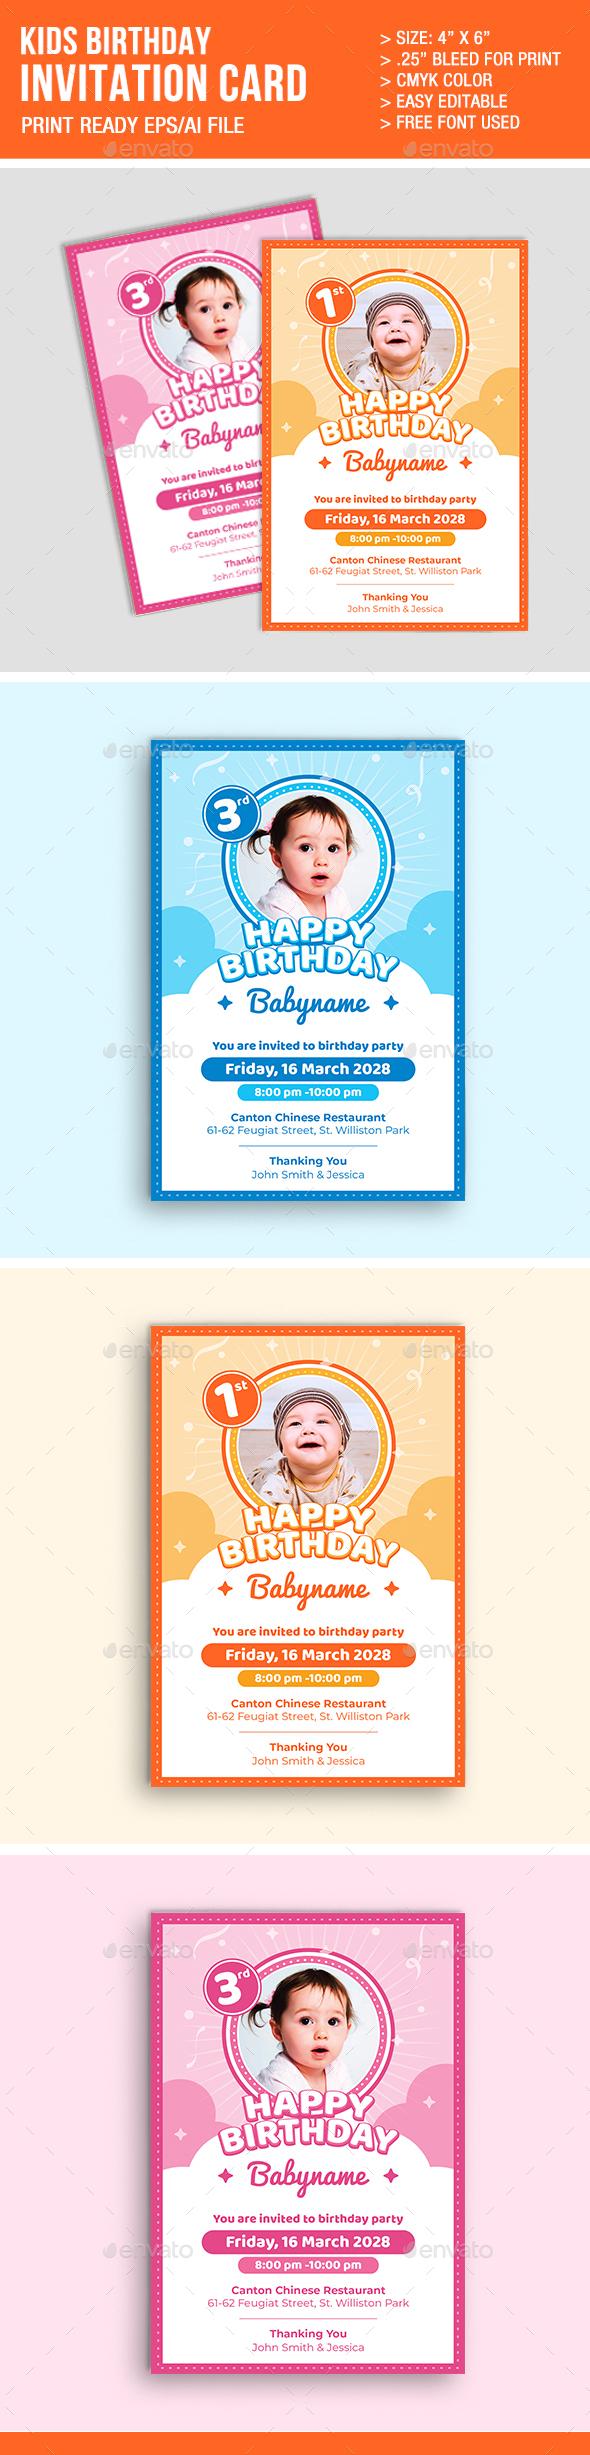 Kids Birthday Invitation Card - Invitations Cards & Invites